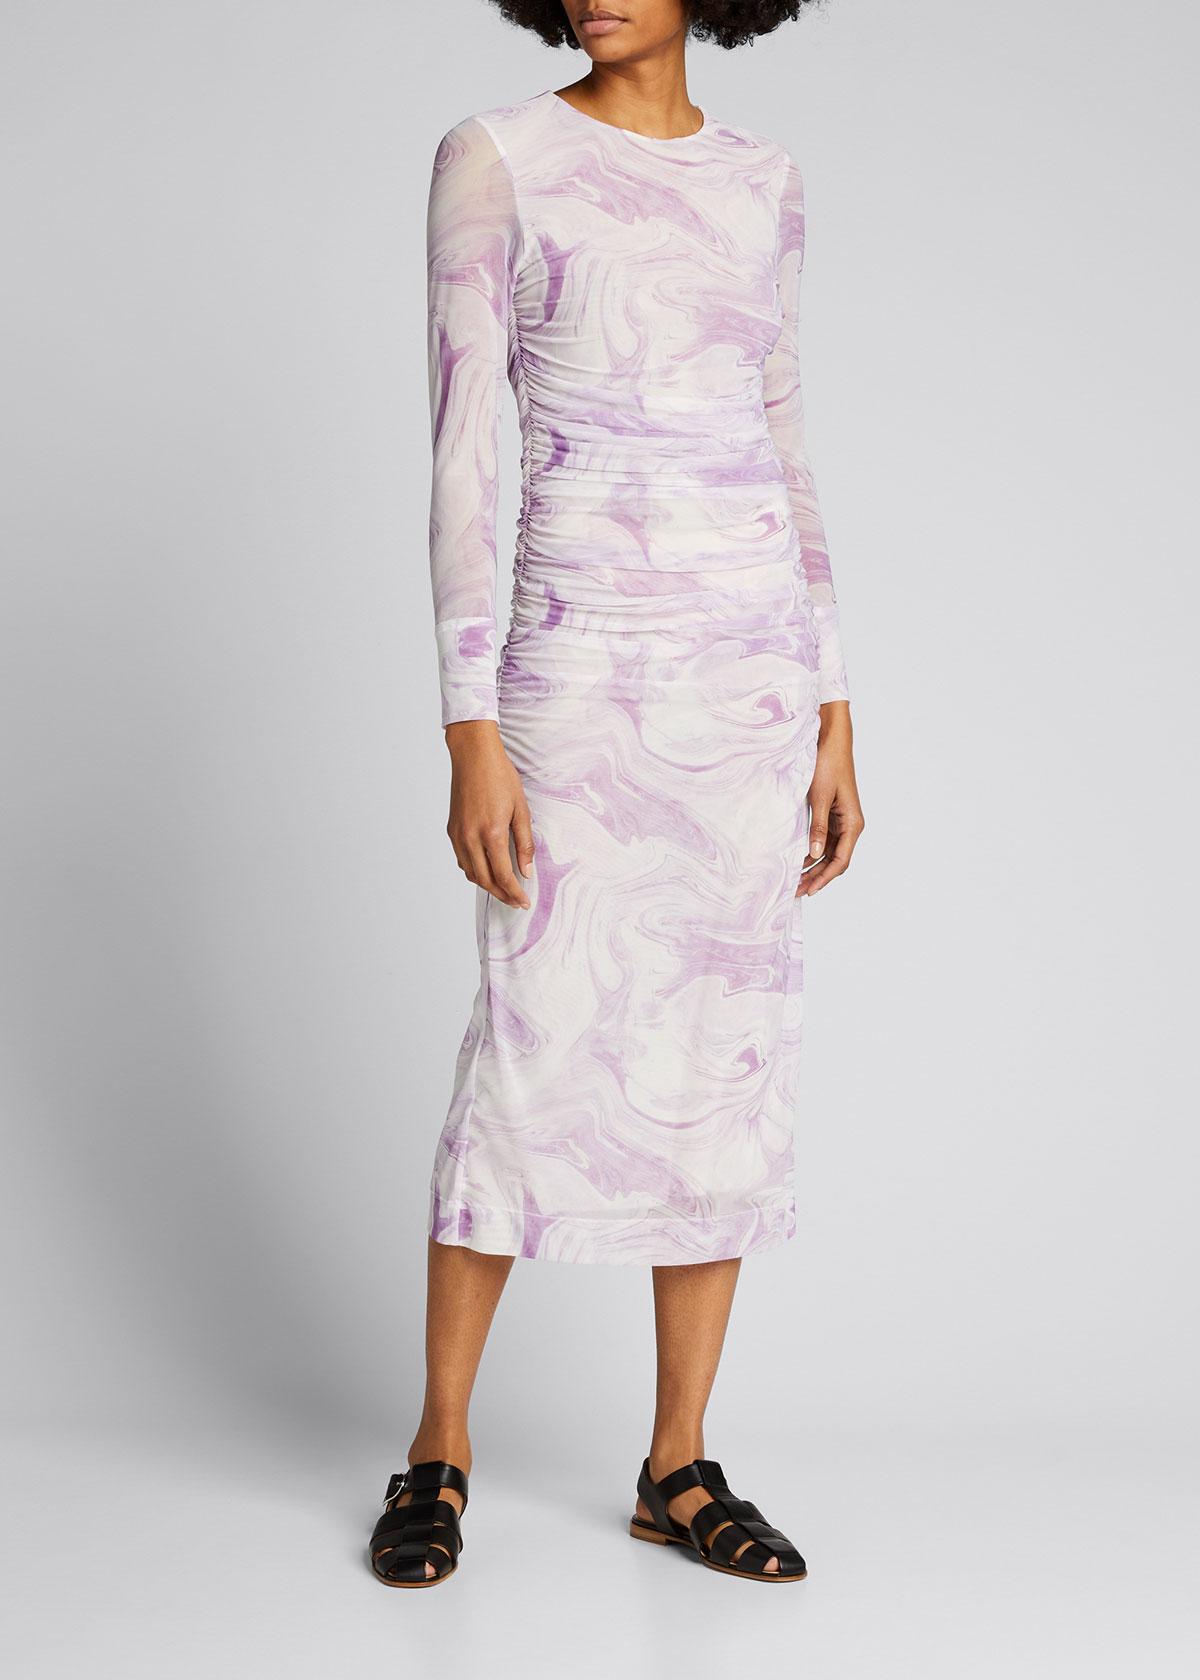 Ganni Dresses MARBLE-PRINT MESH RUSHED MIDI DRESS